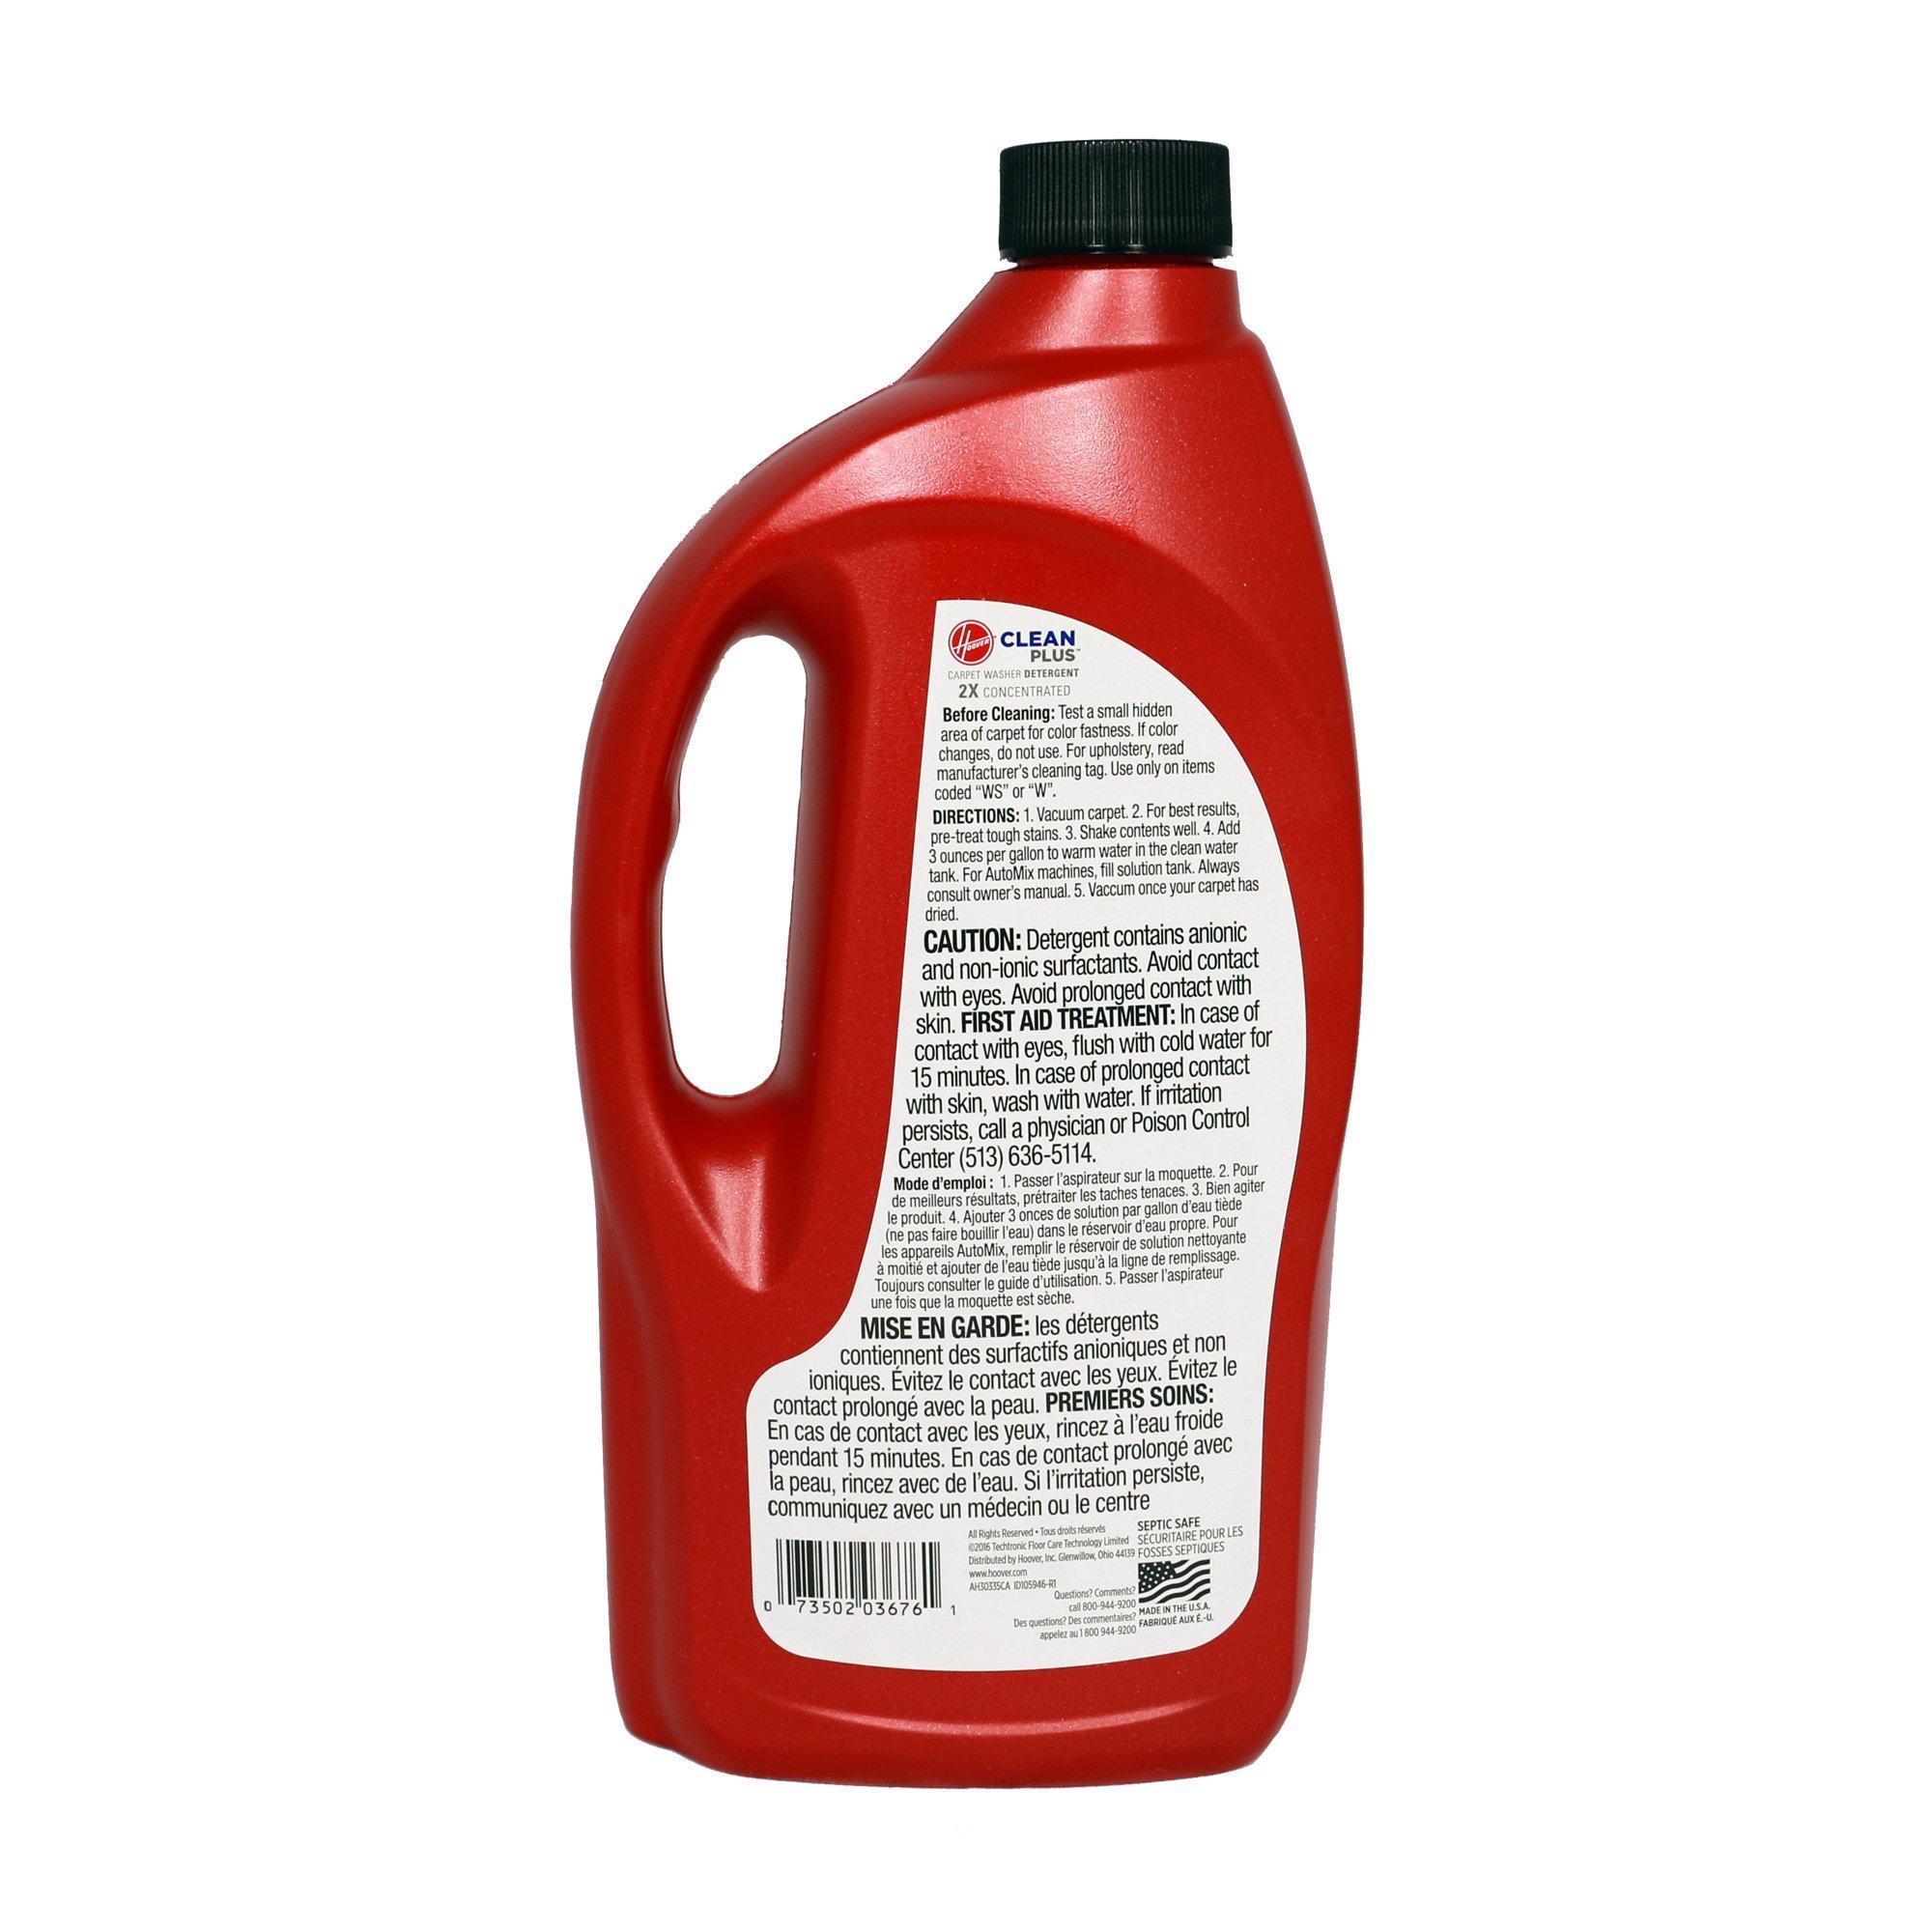 CleanPlus 2X Carpet Cleaner & Deodorizer, 32 oz.2